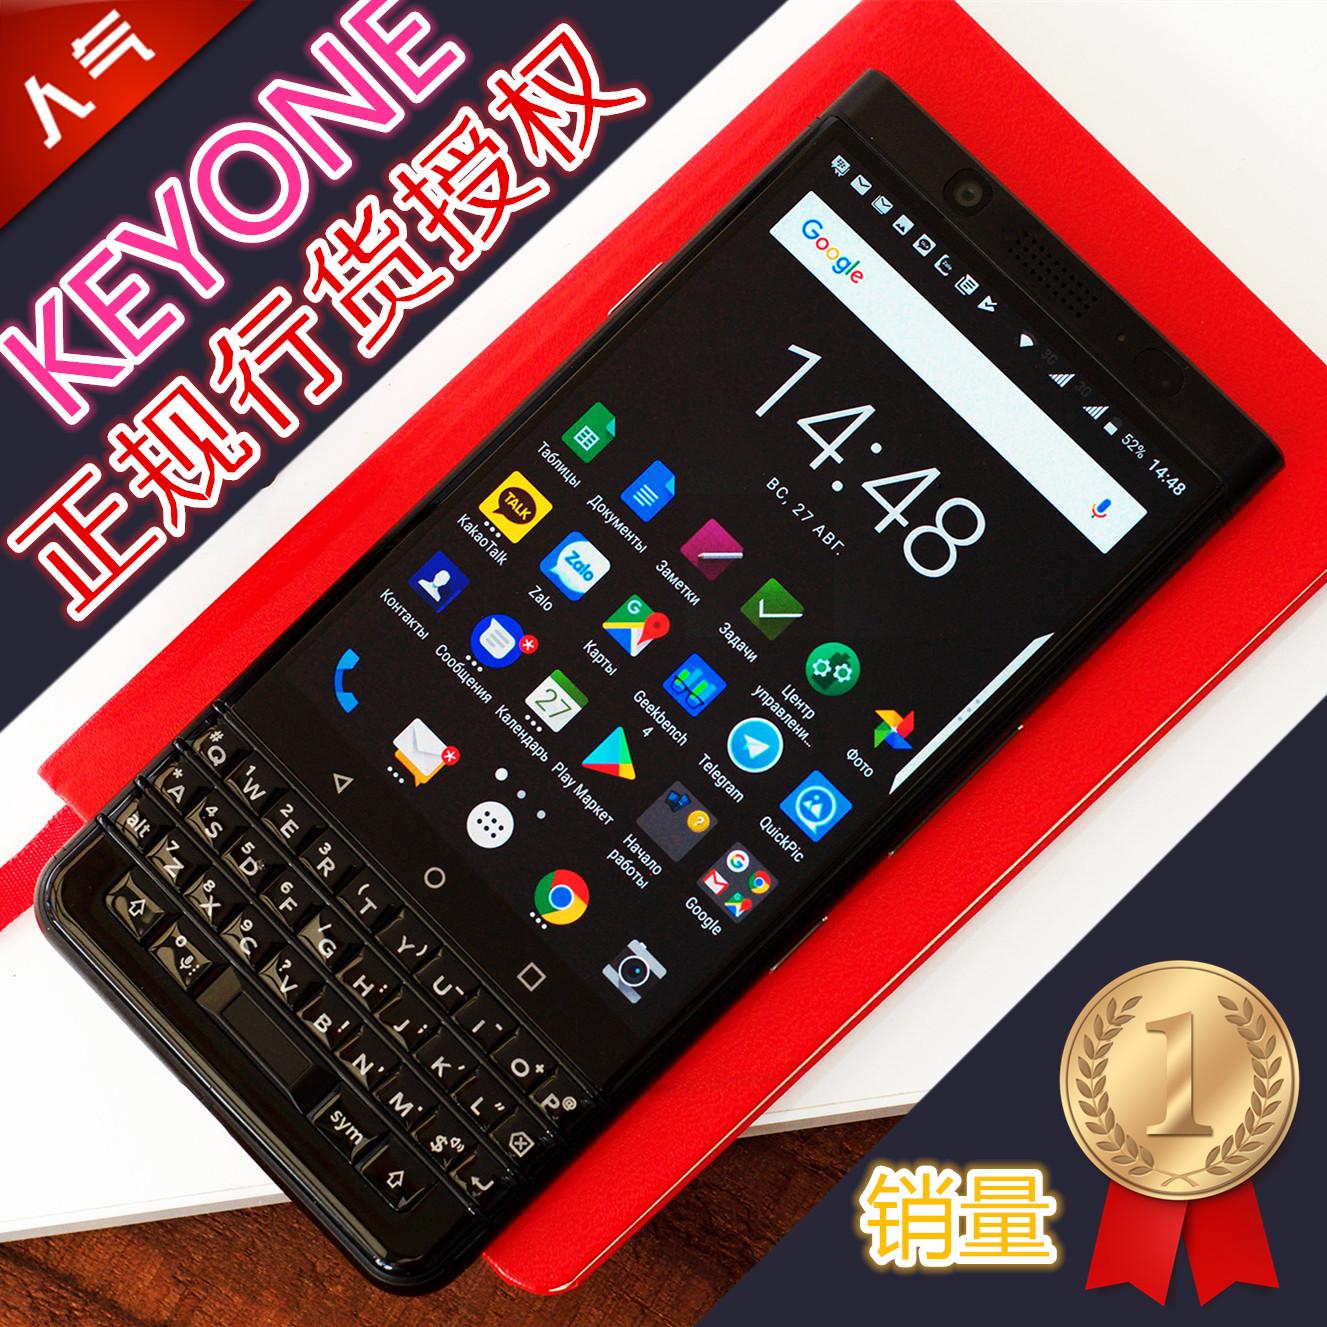 blackberry/黑莓 keyone行货全键盘三网4g全网通电信智能商务手机